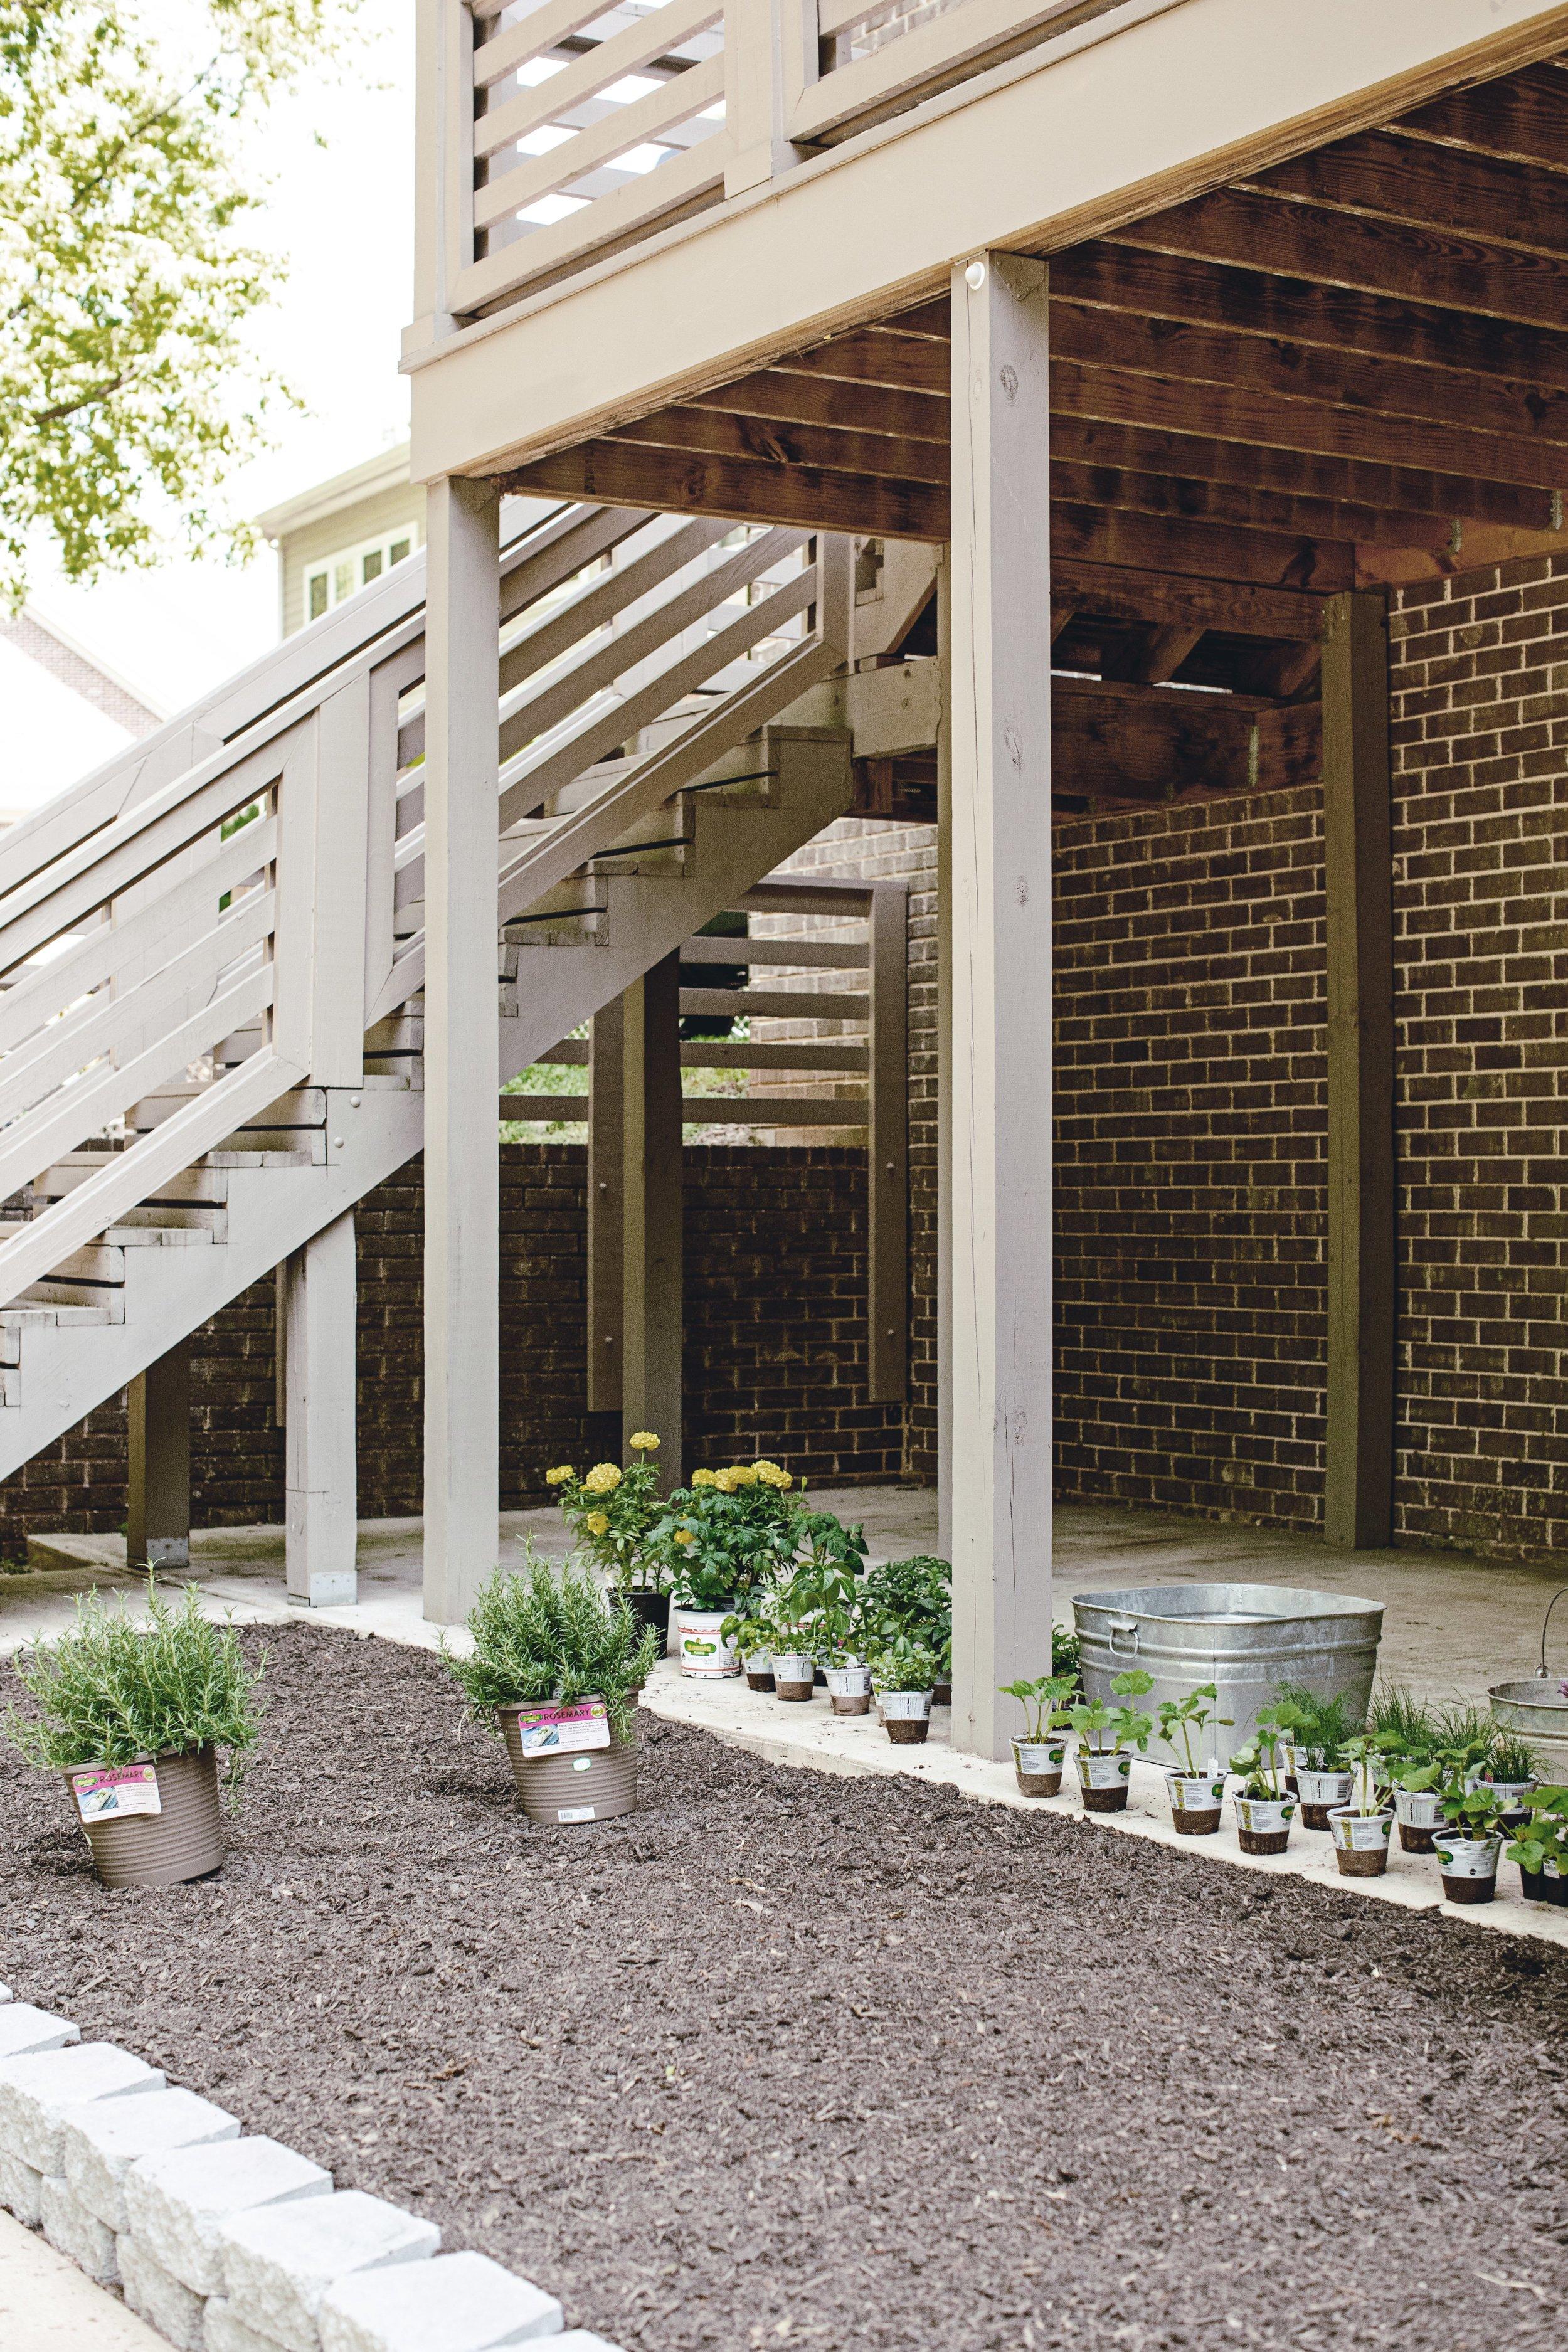 planting your farmhouse garden / heirloomed for the Home Depot garden series